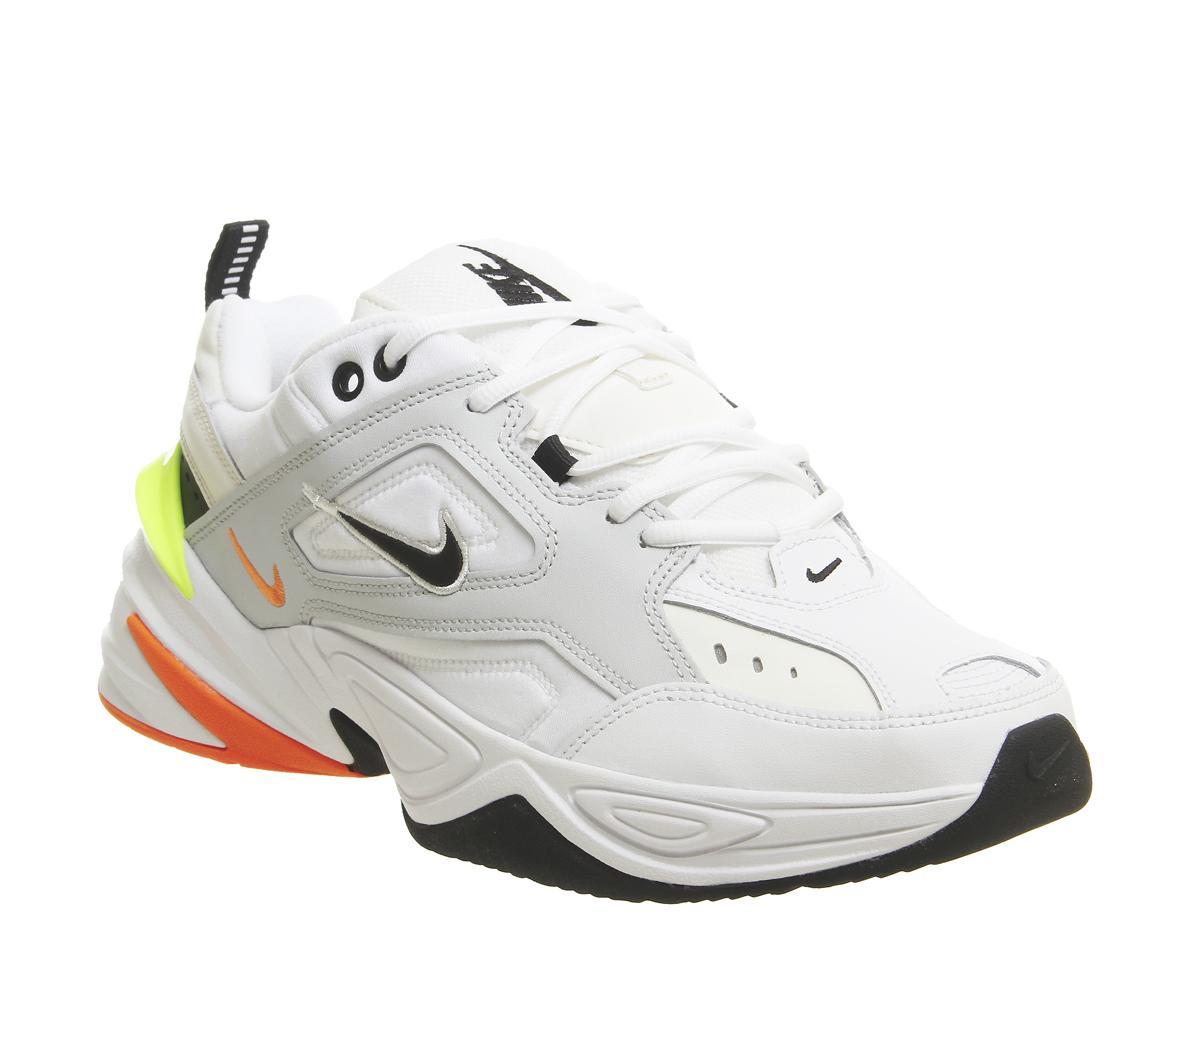 Nike M2k Tekno Trainers Pure Platinum